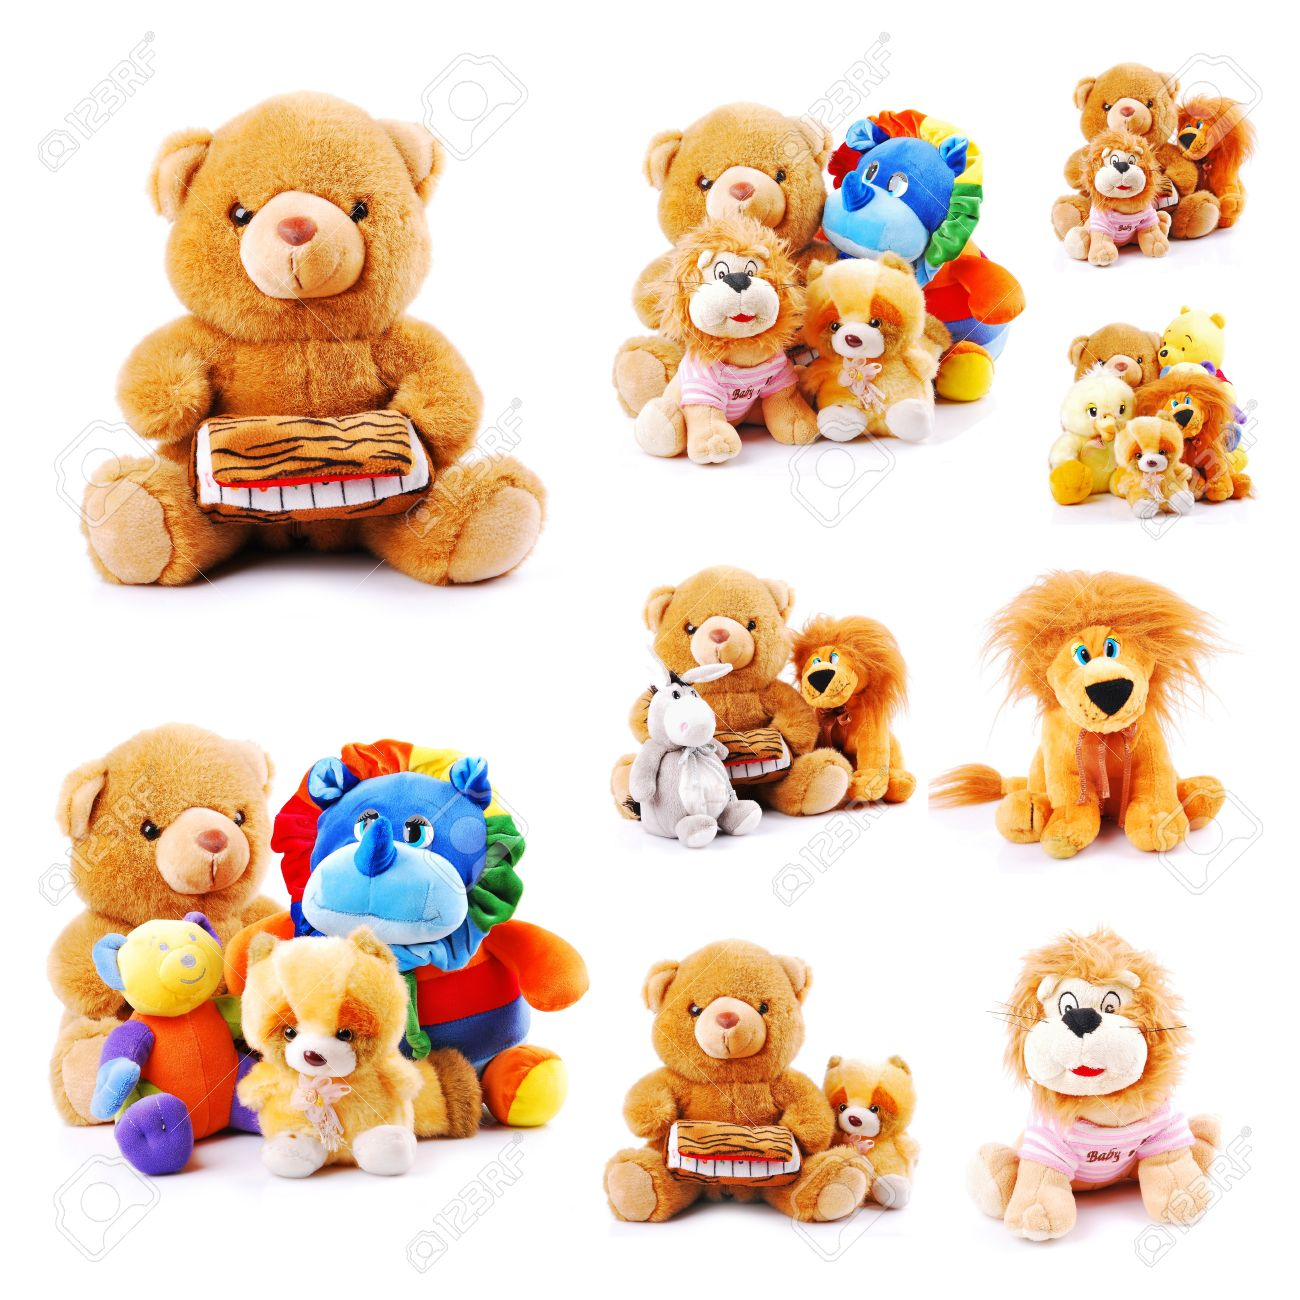 Plush toy animals isolated on a white background Stock Photo - 13990956